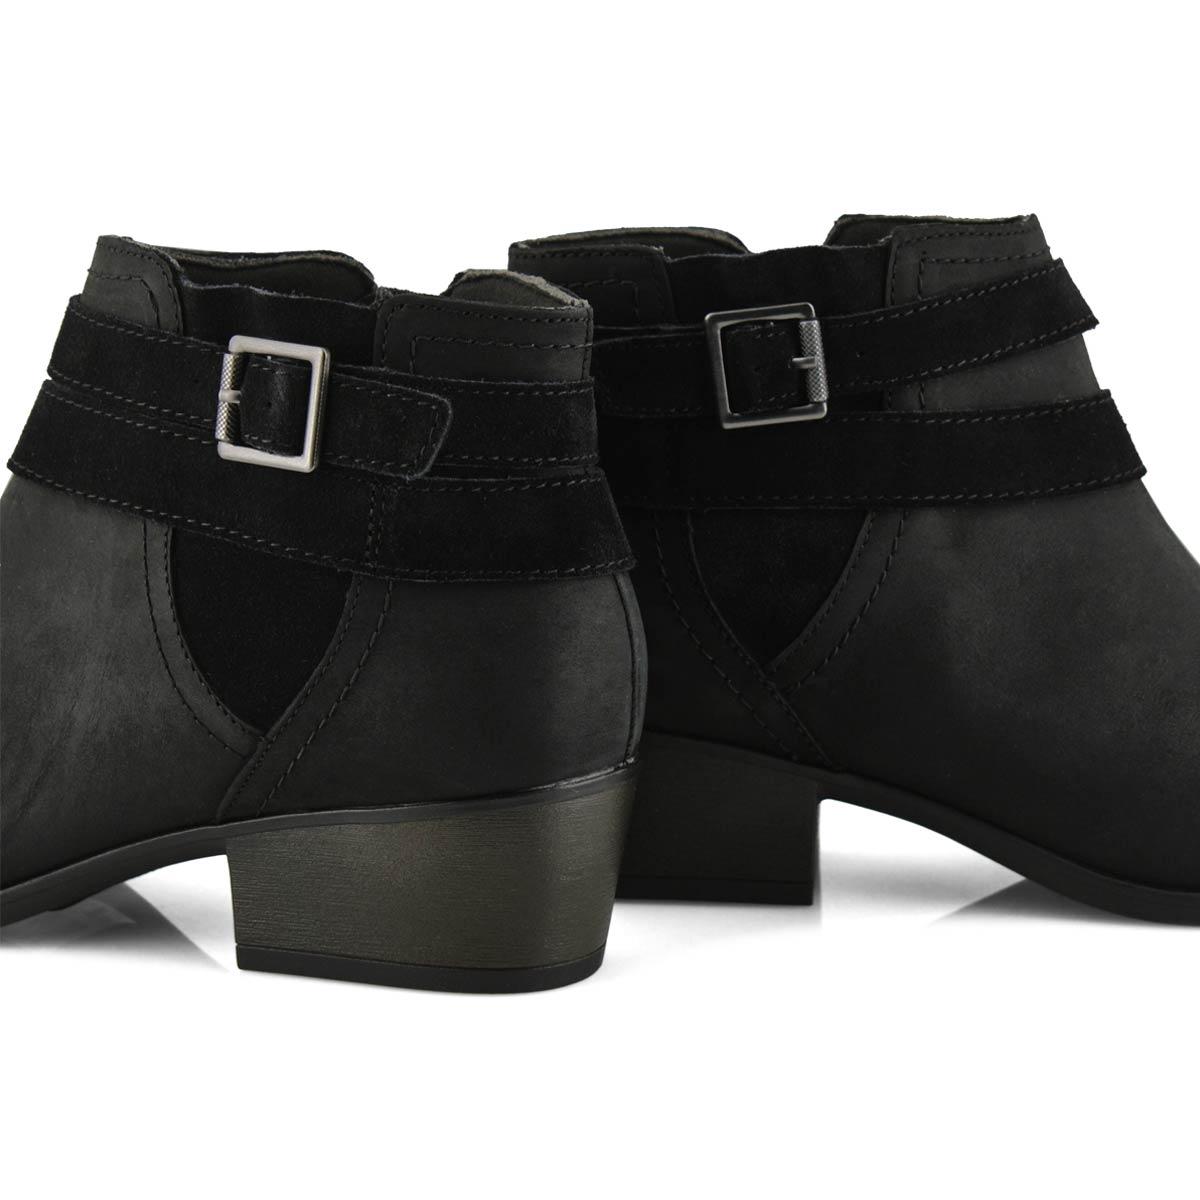 Women's Adreena Show Ankle Boot - Black